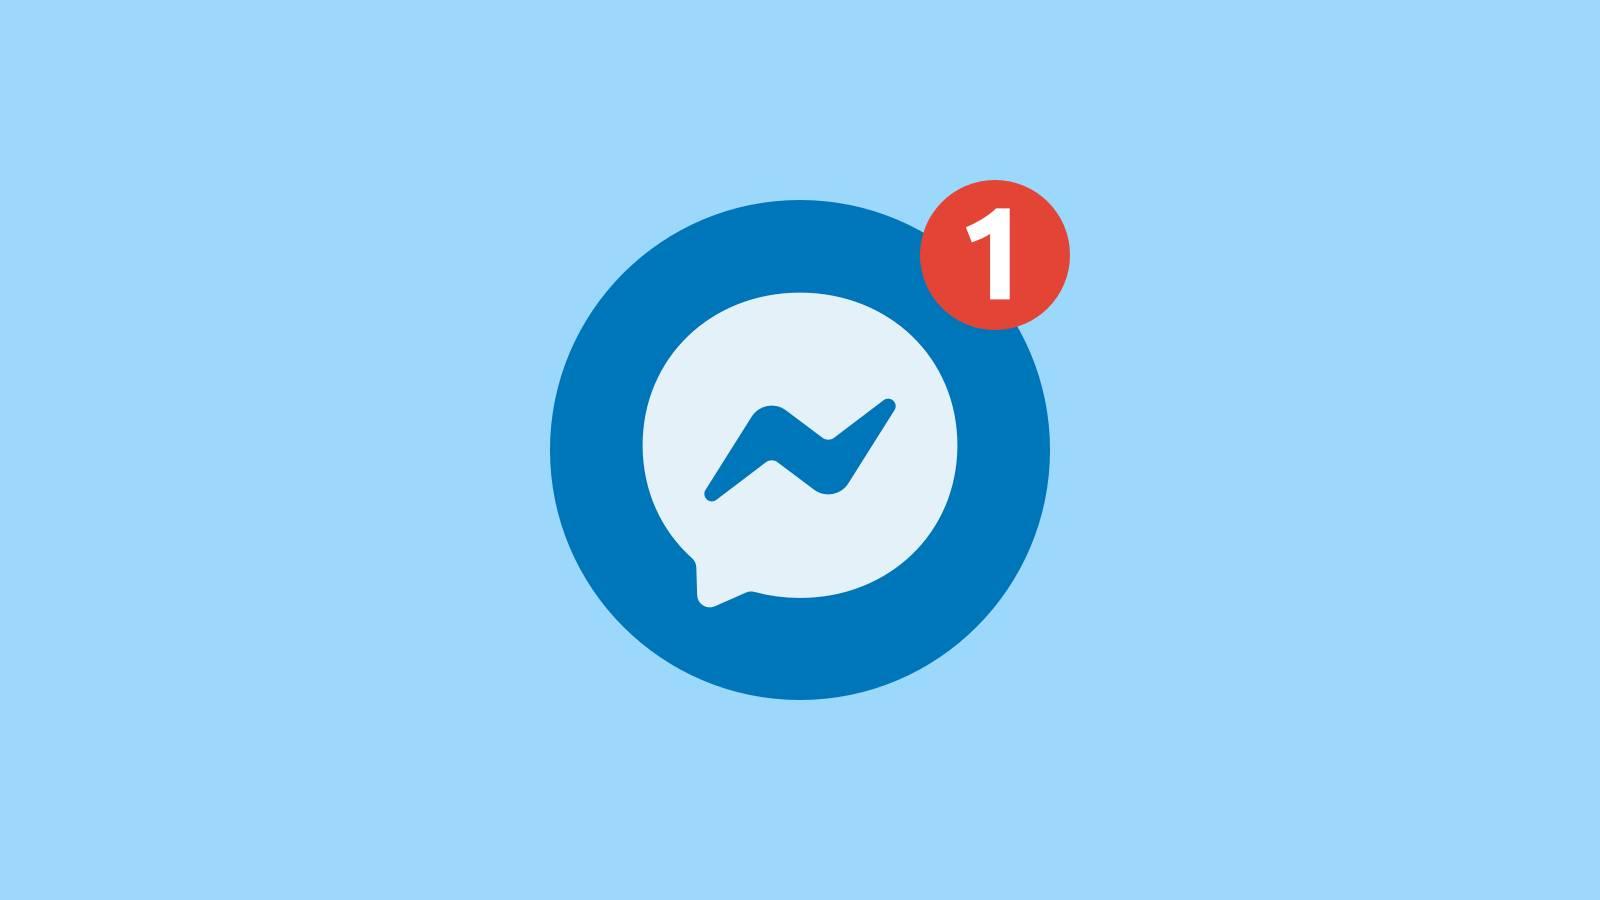 Facebook Messenger Update Nou cu Schimbari pentru Telefoane, Tablete